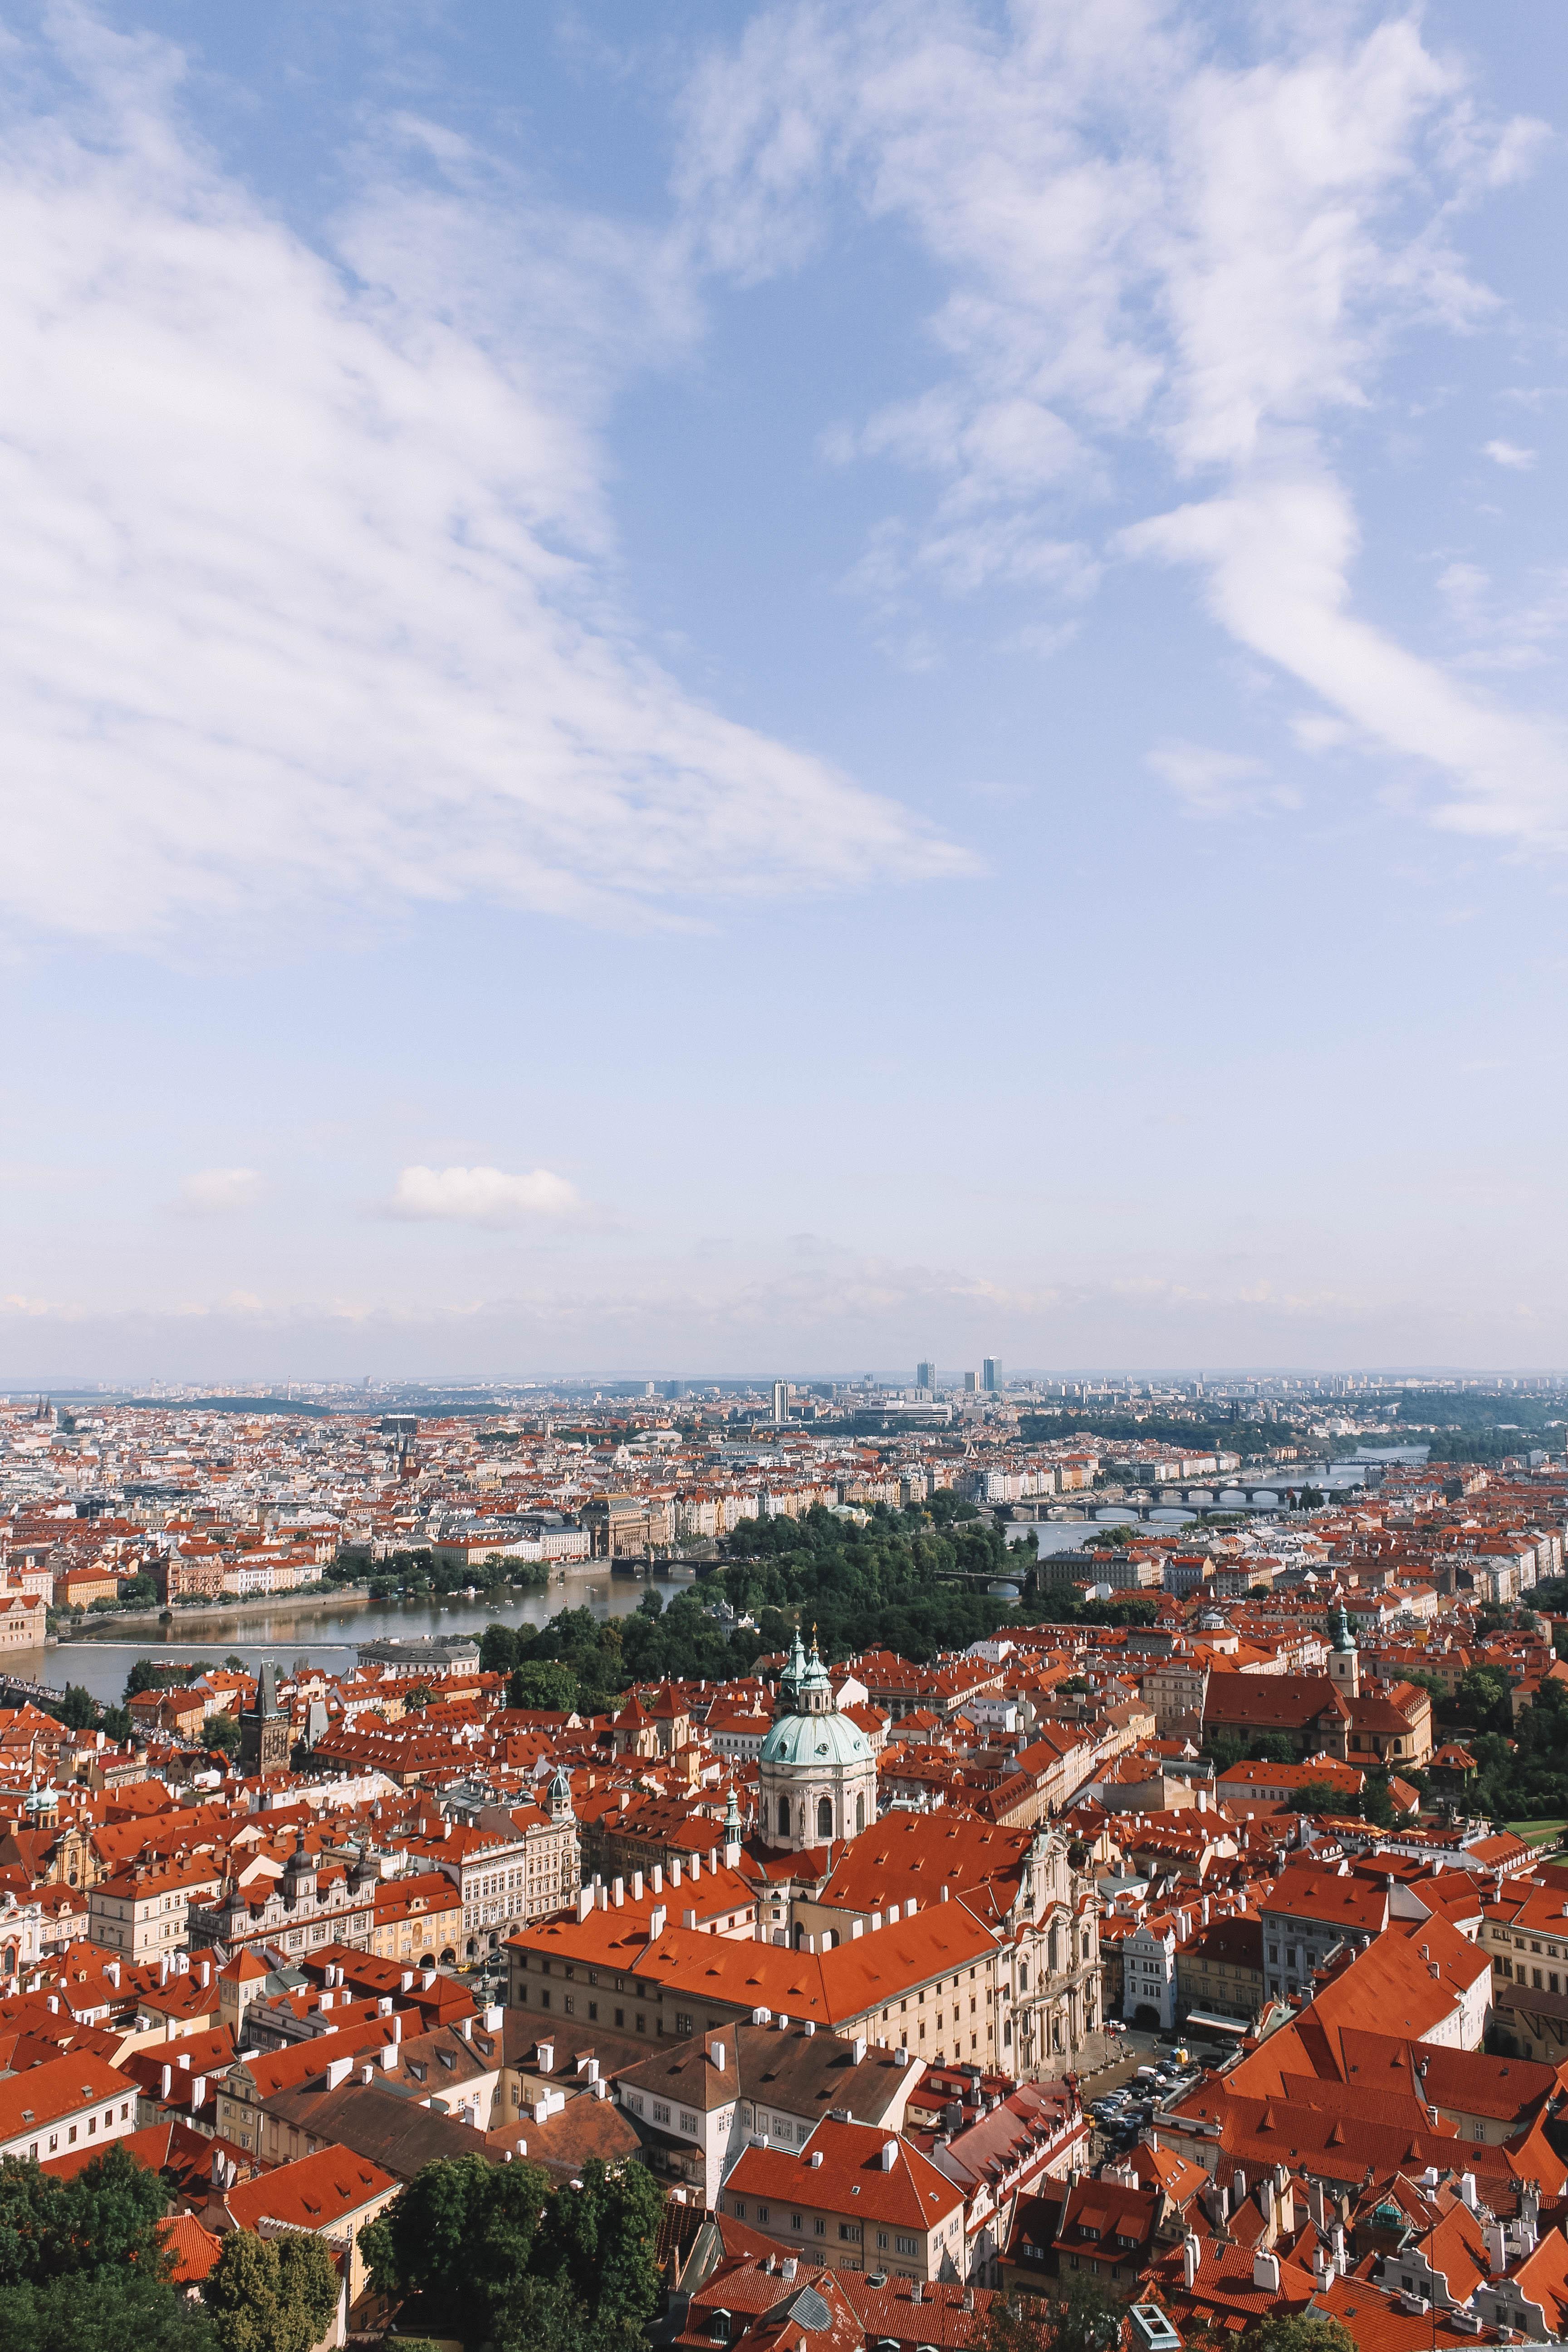 Prague viewed from the Katedrála Sv. Vita